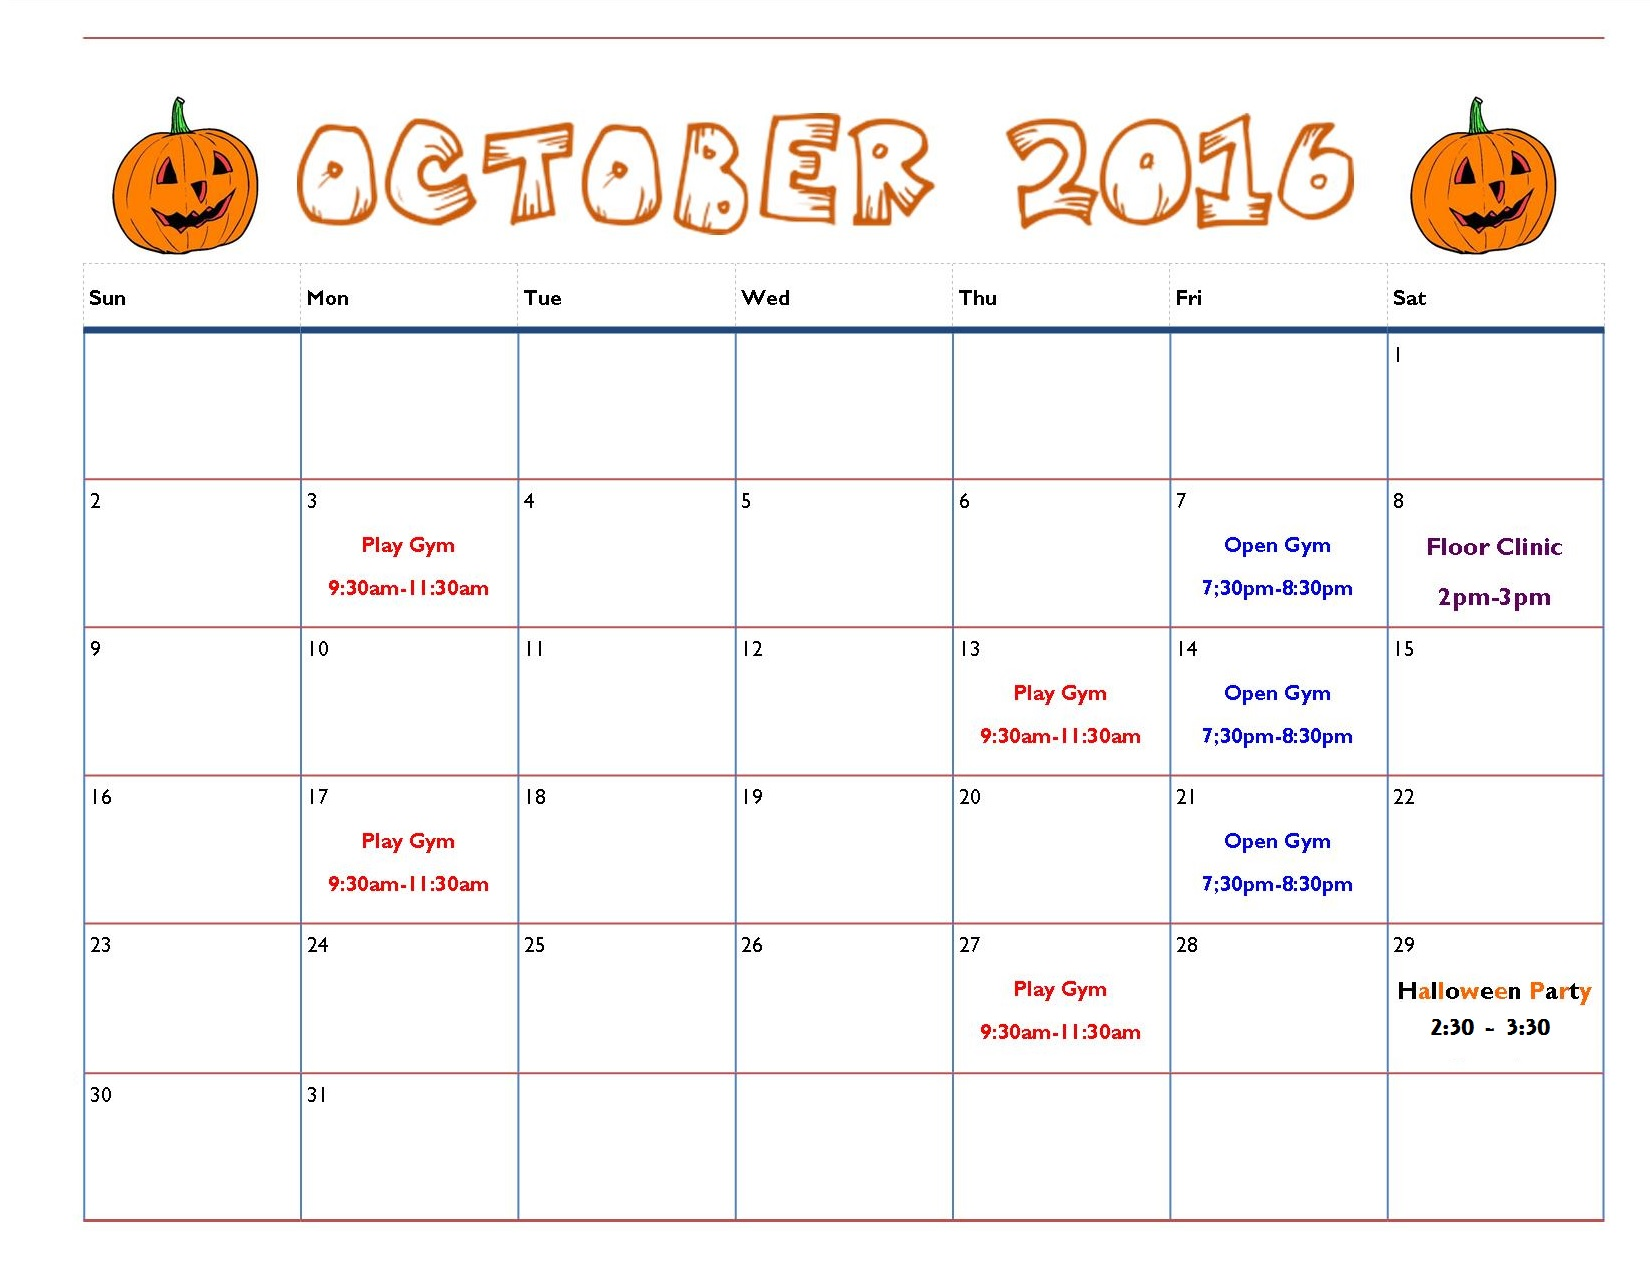 rotterdam-schenectady-october-2016-calendar